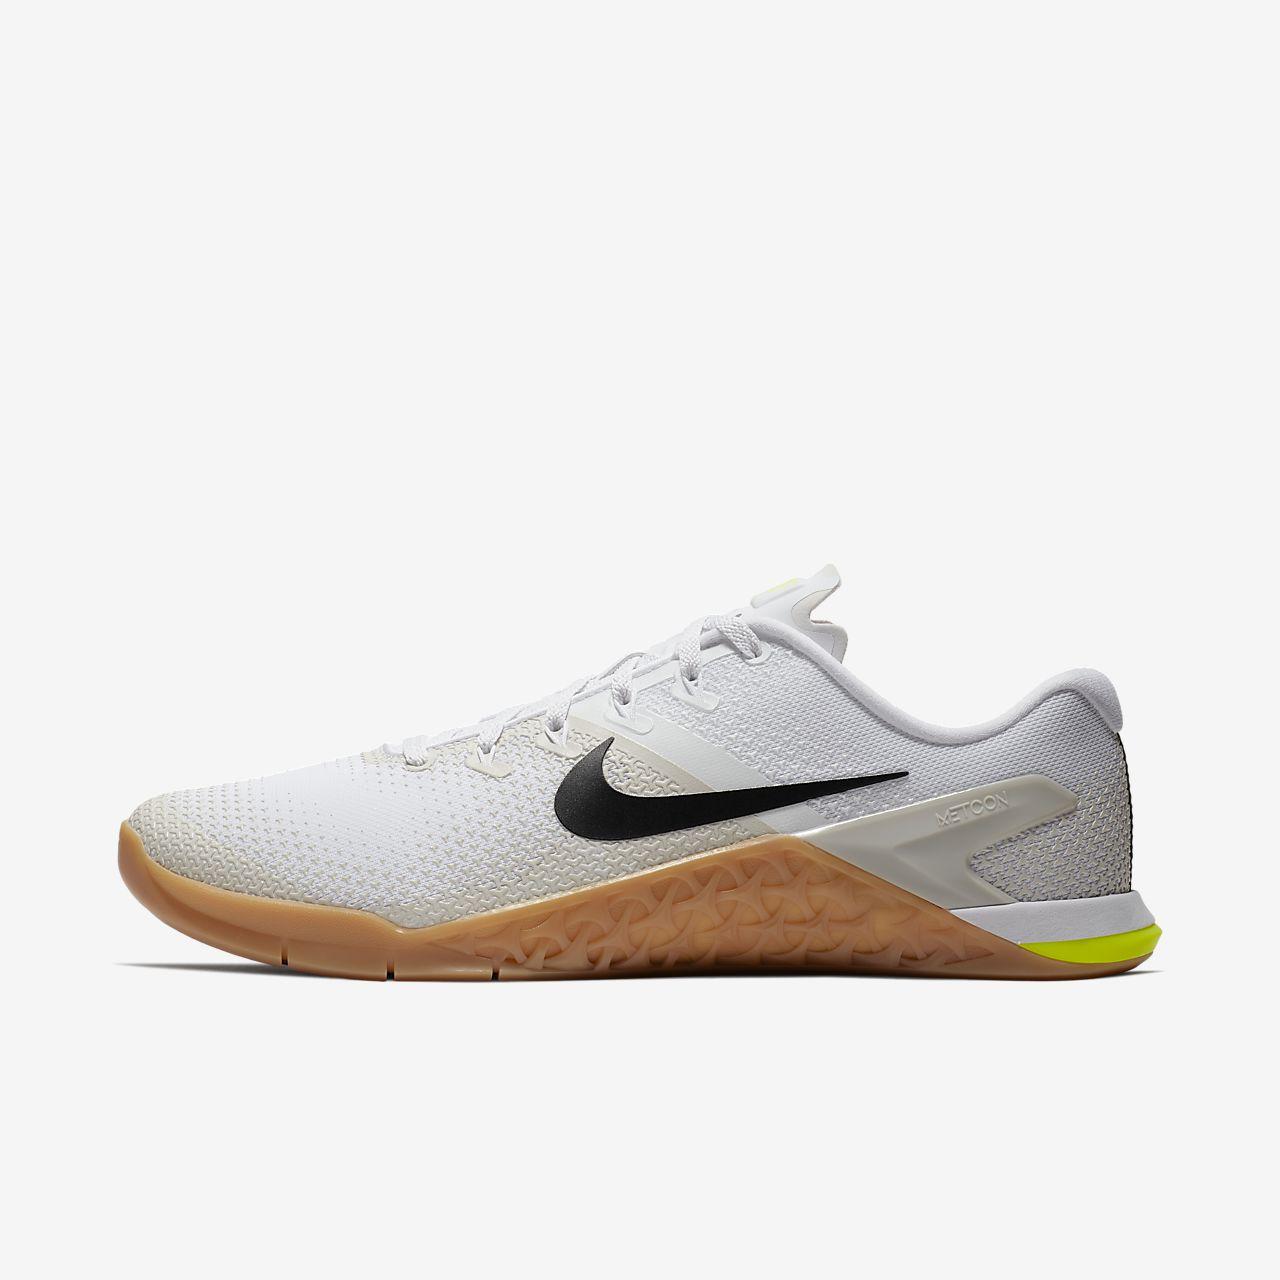 ... Weightlifting Shoe Nike Metcon 4 Men's Cross Training, Weightlifting  Shoe